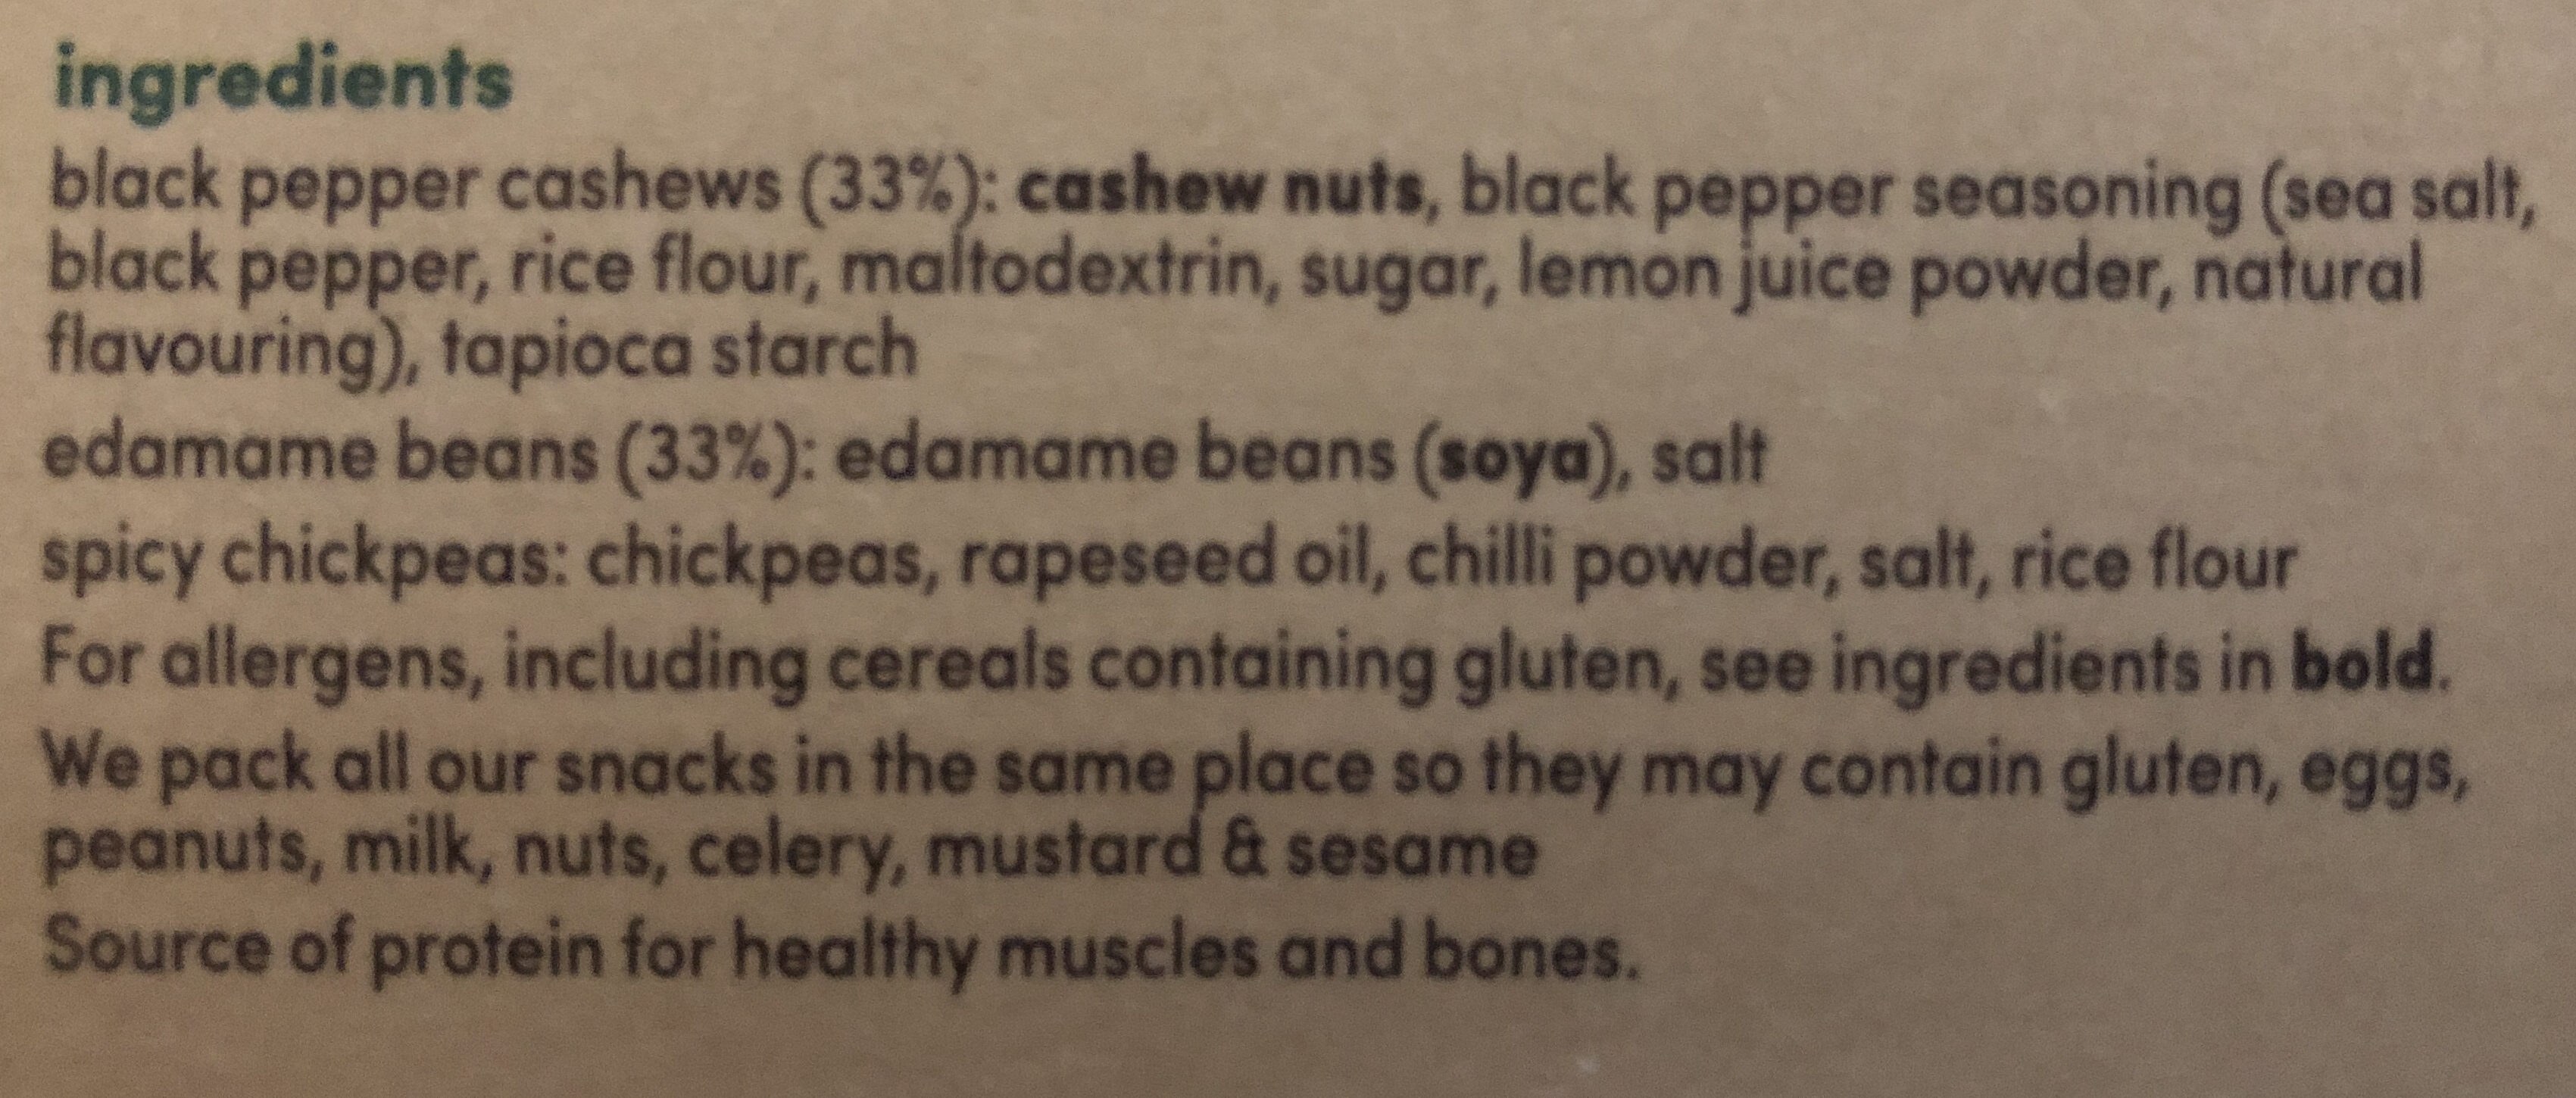 Graze Snack Box Veggie Protein Power - Ingrediënten - en